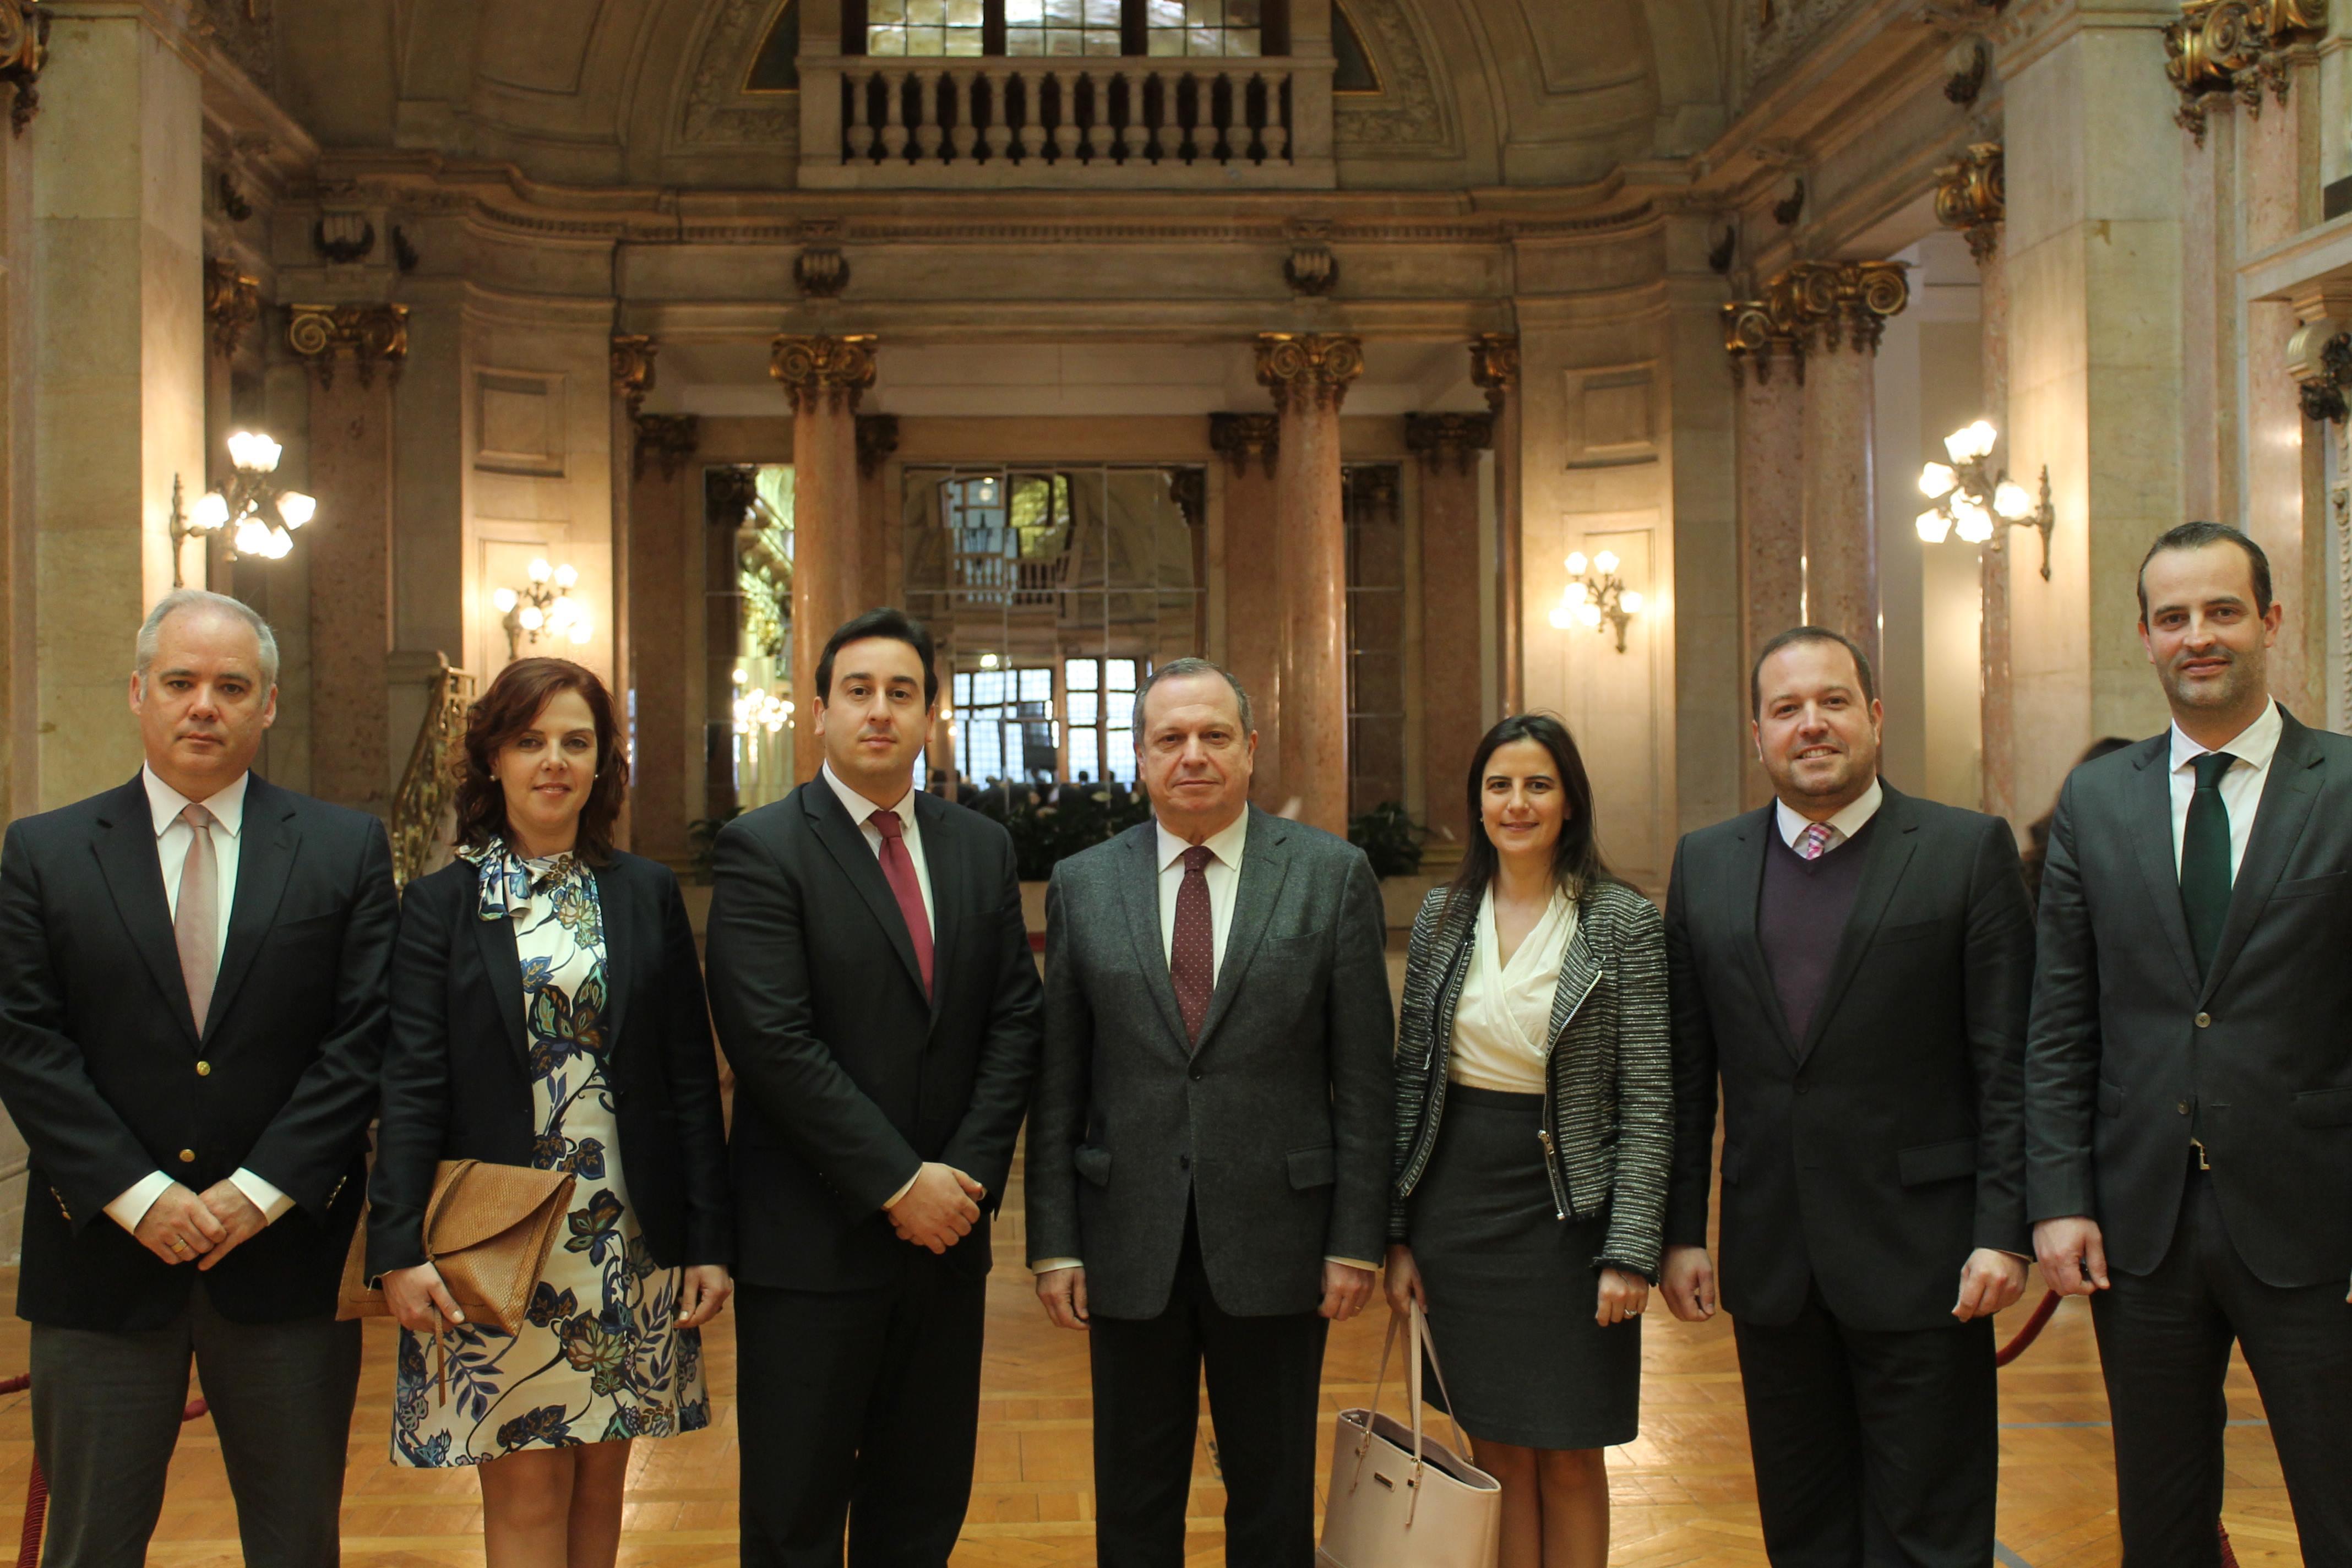 Partido Socialista nacional realiza Jornadas Parlamentares nos Açores